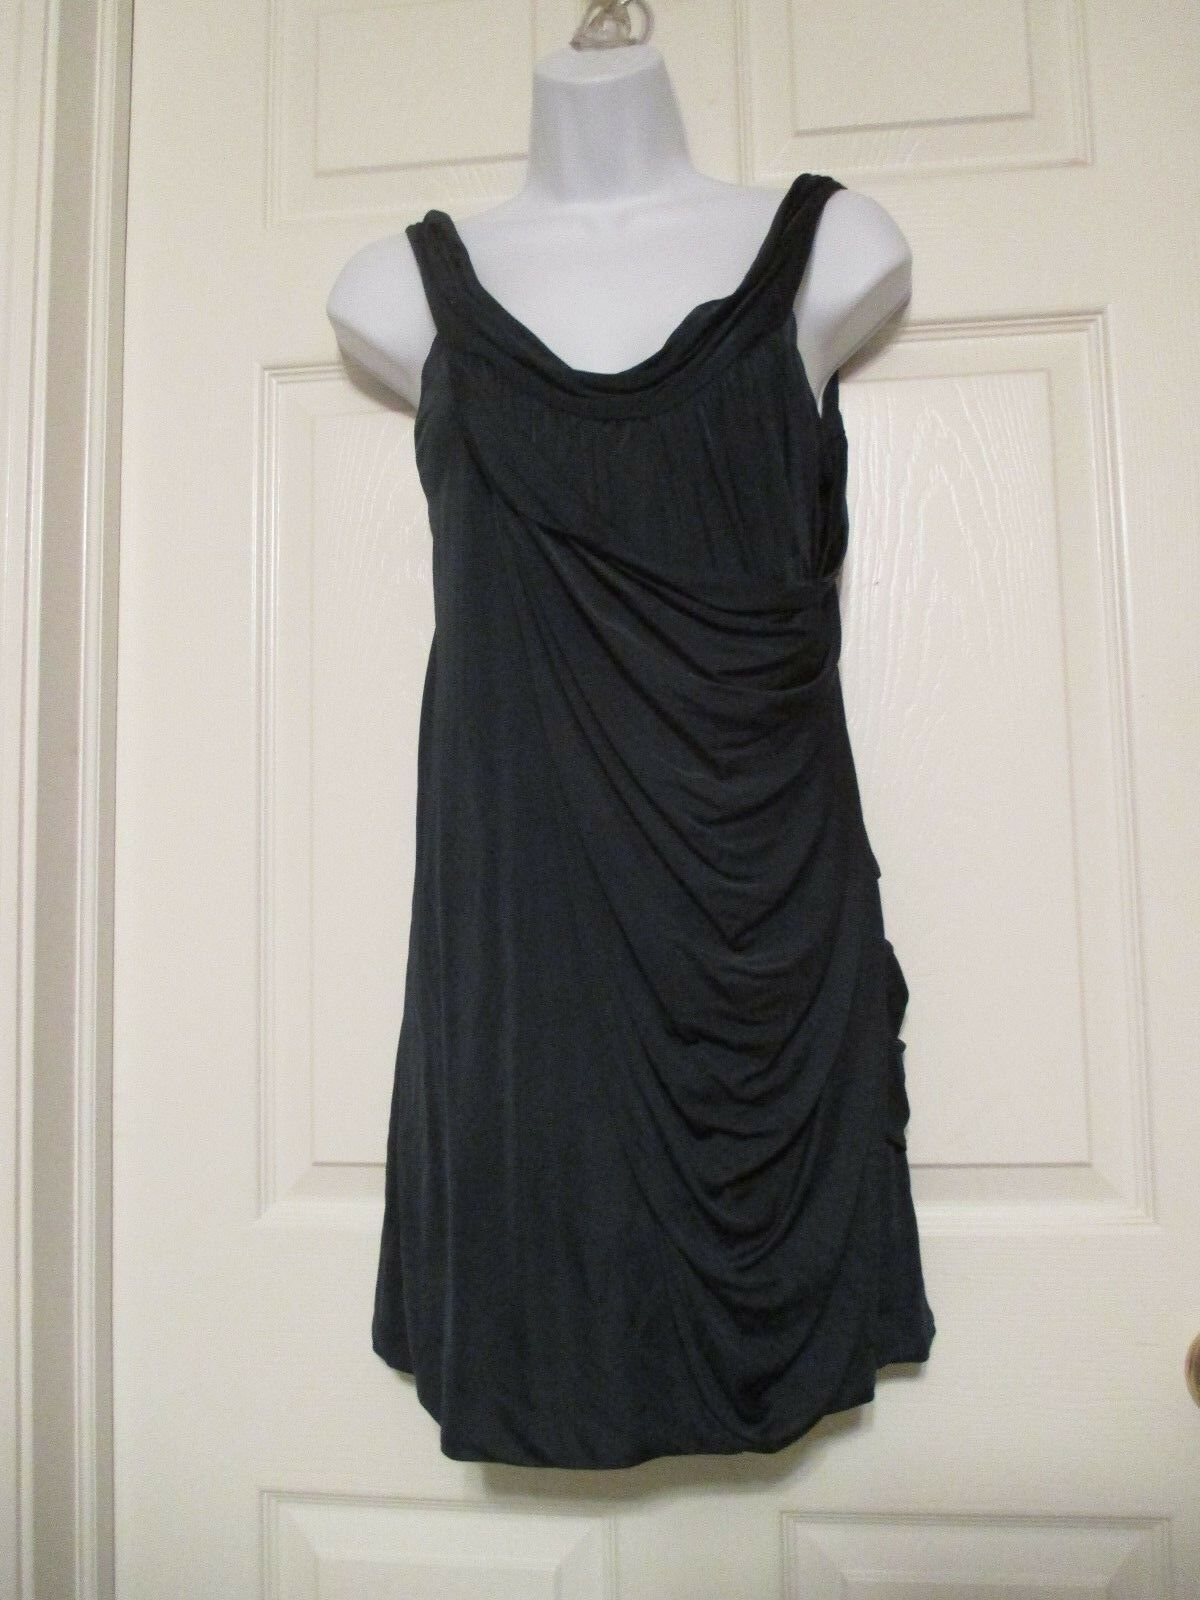 Yigal Azrouel New York Rushed Draped Dress    Tunic Top Größe 3